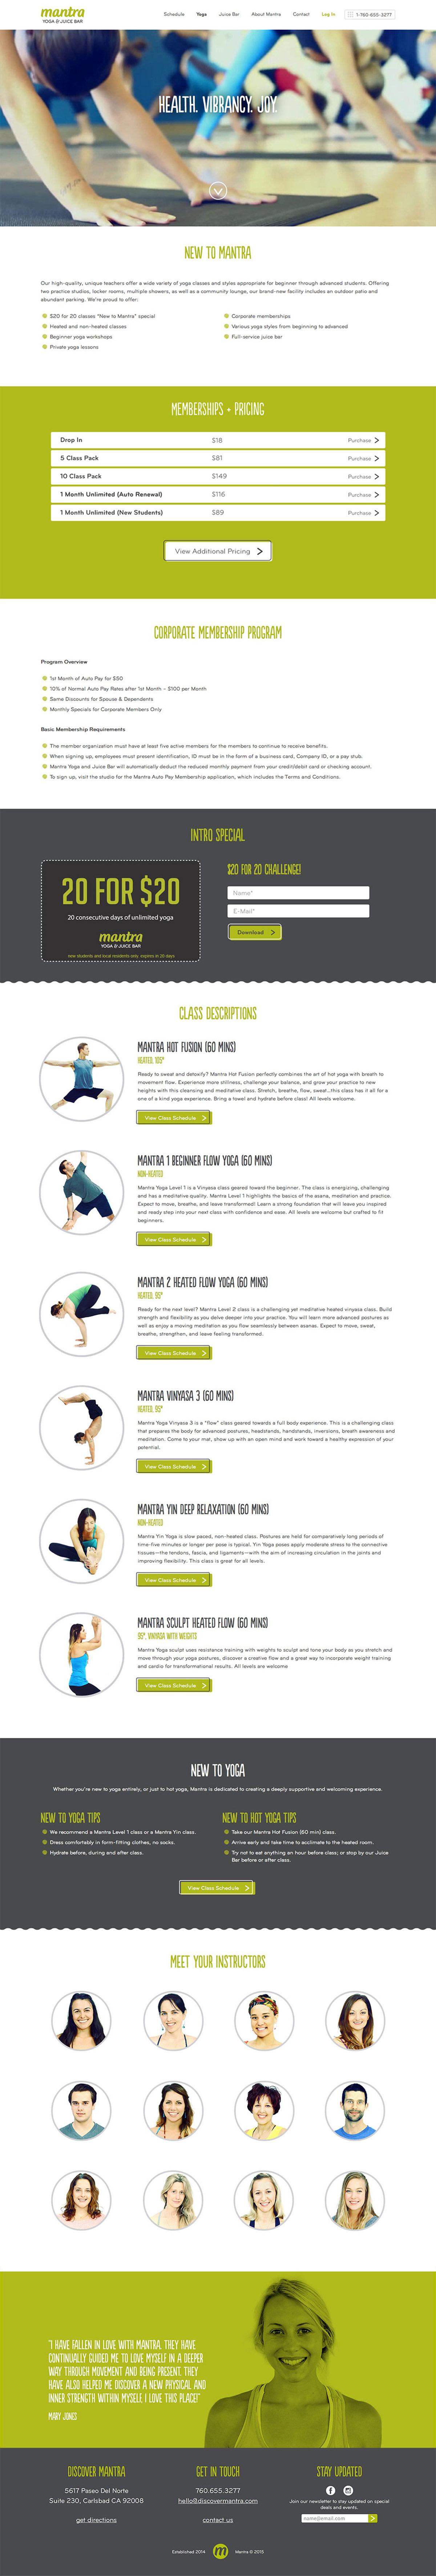 igntye website design agency mantra yoga and juice